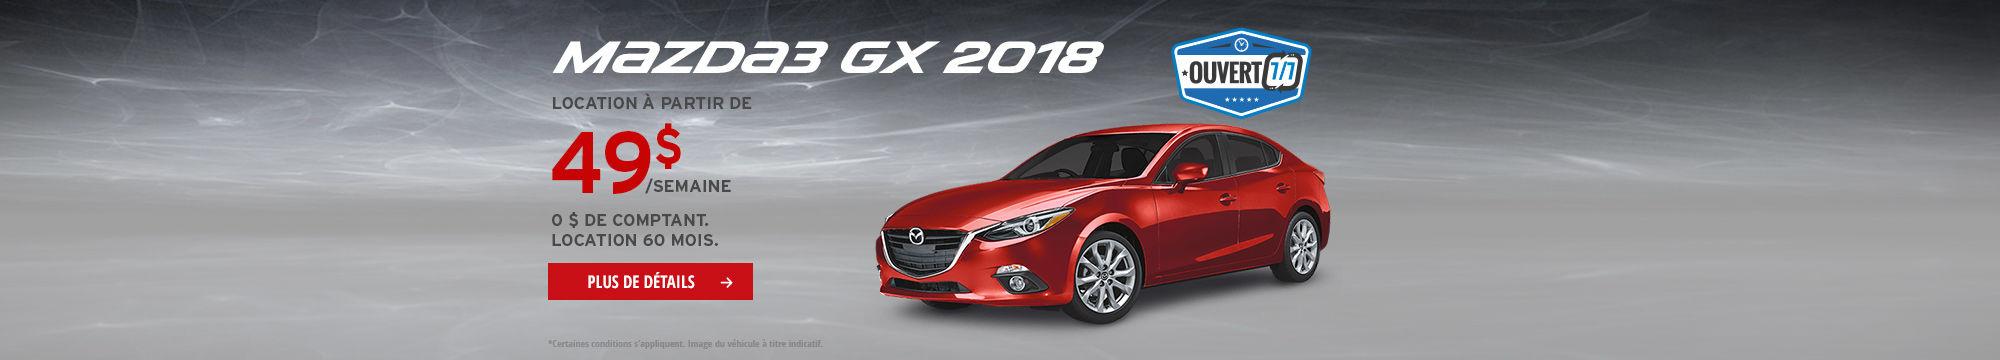 L'événement traction intégrale i-ACTIV - Mazda3